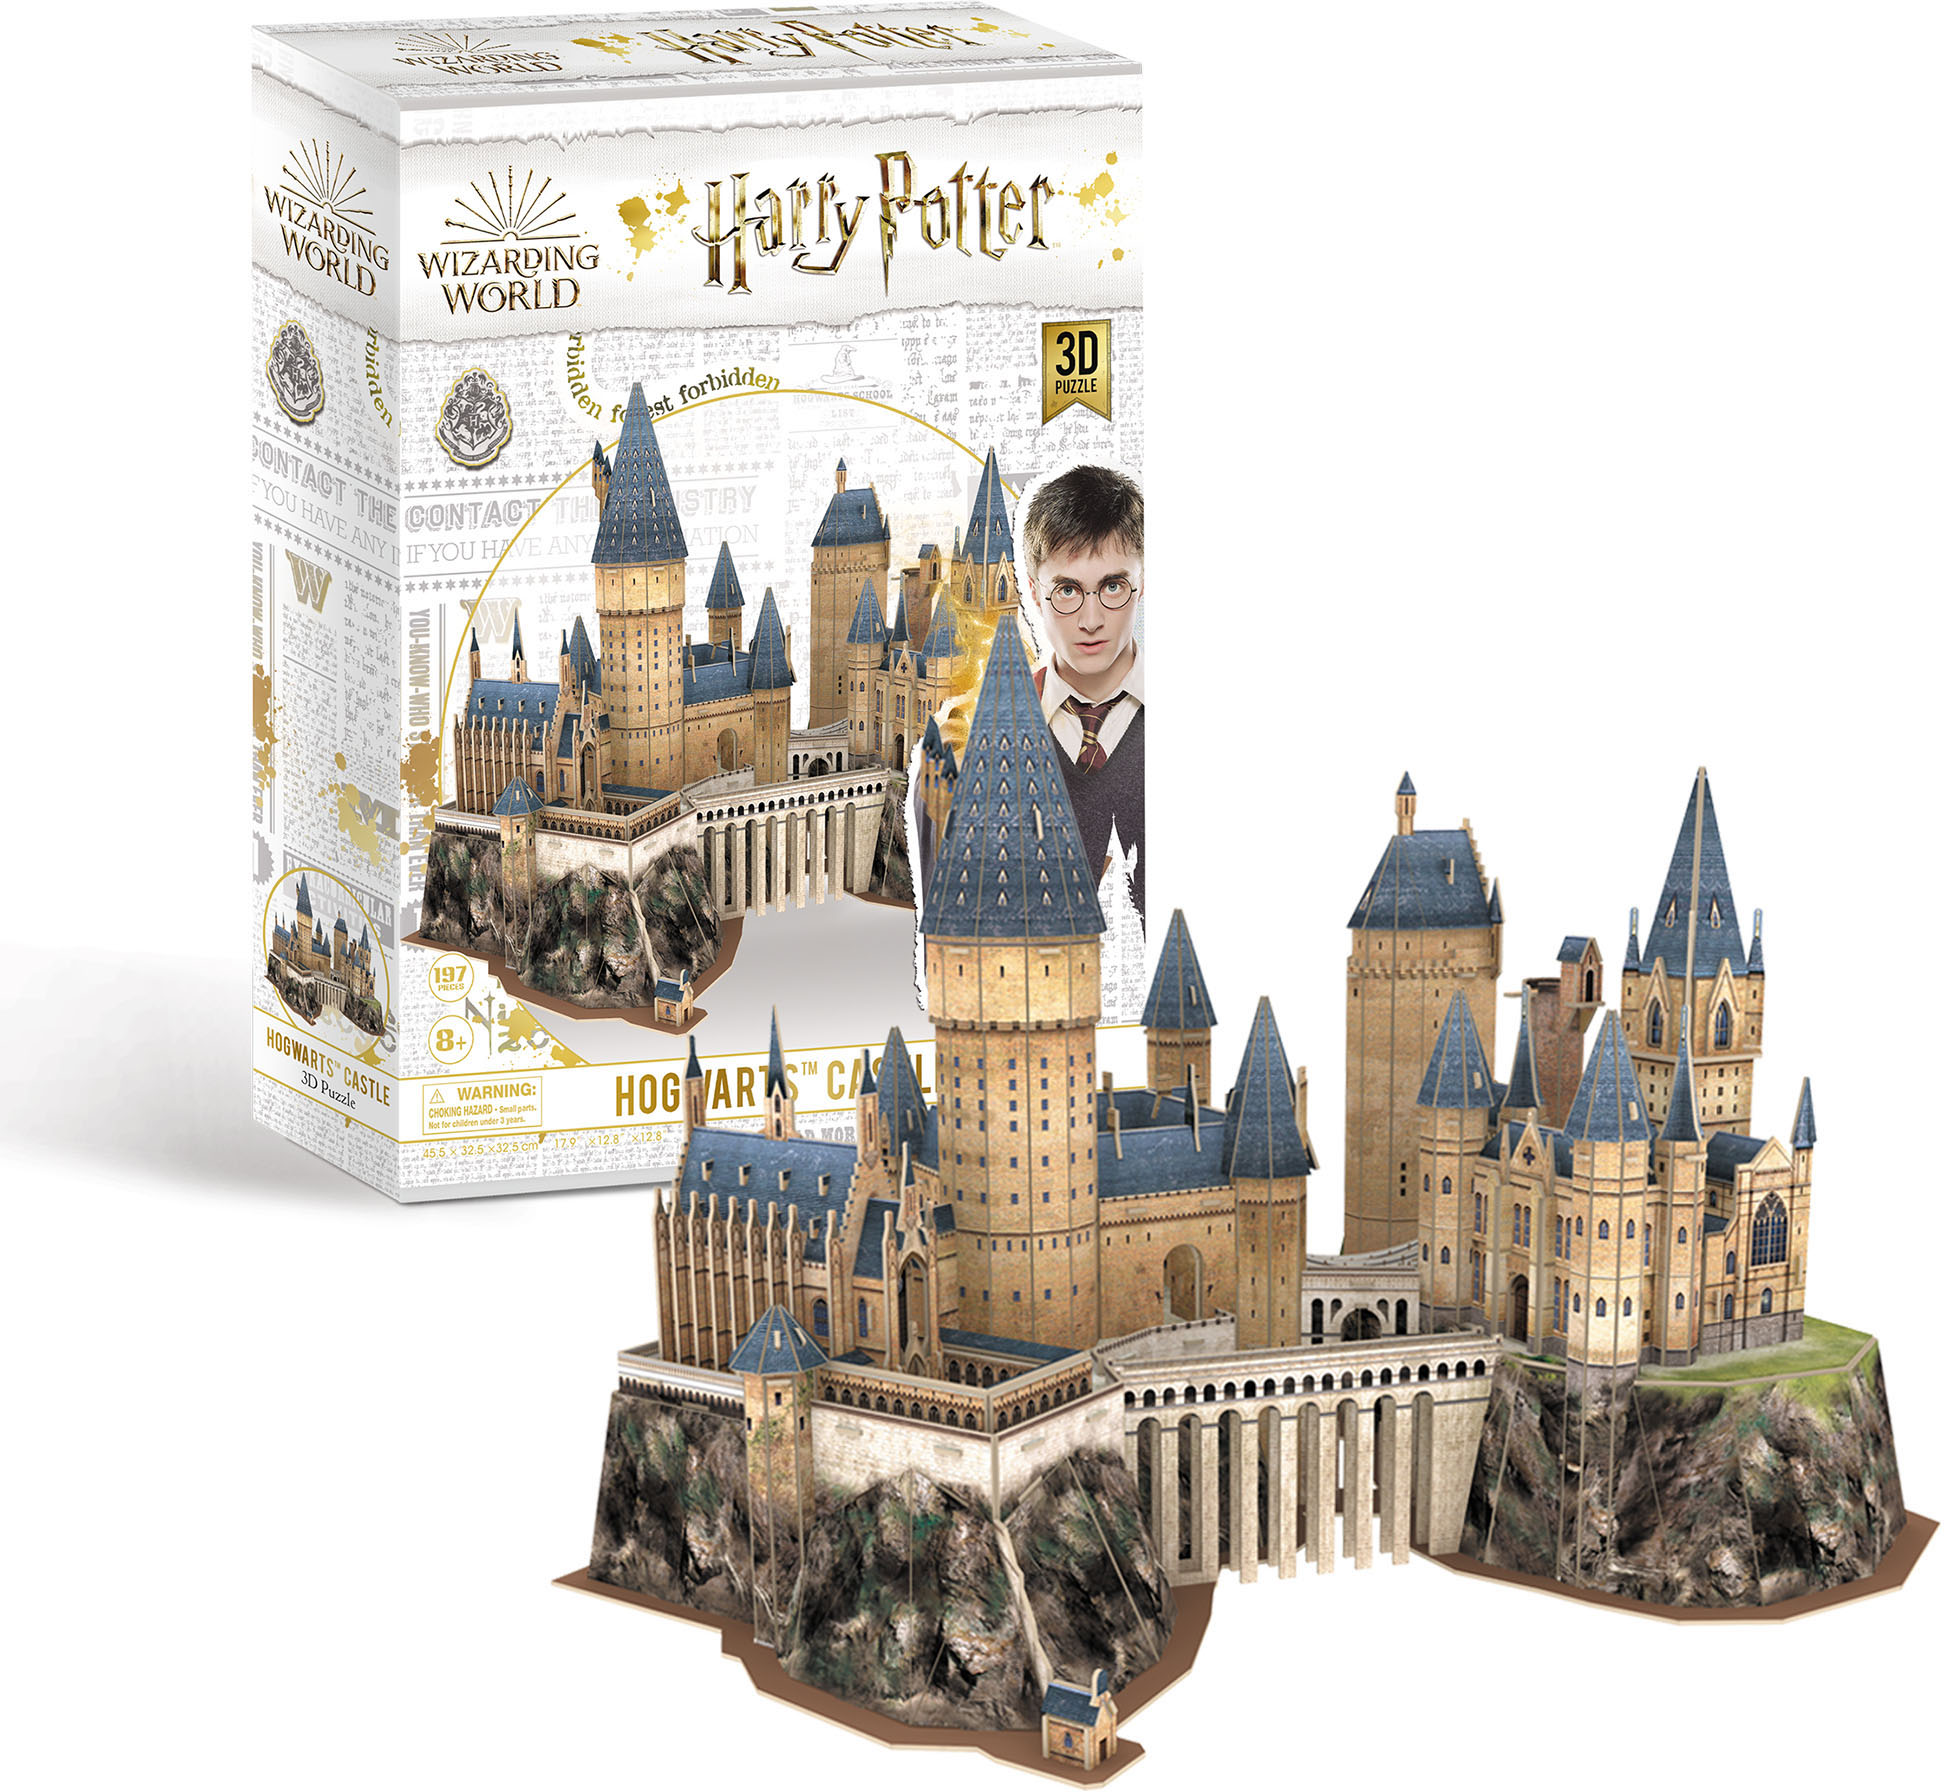 Revell 3D-Puzzle Harry Potter Hogwarts™ Castle, das Schloß braun Kinder 3D Puzzle Gesellschaftsspiele